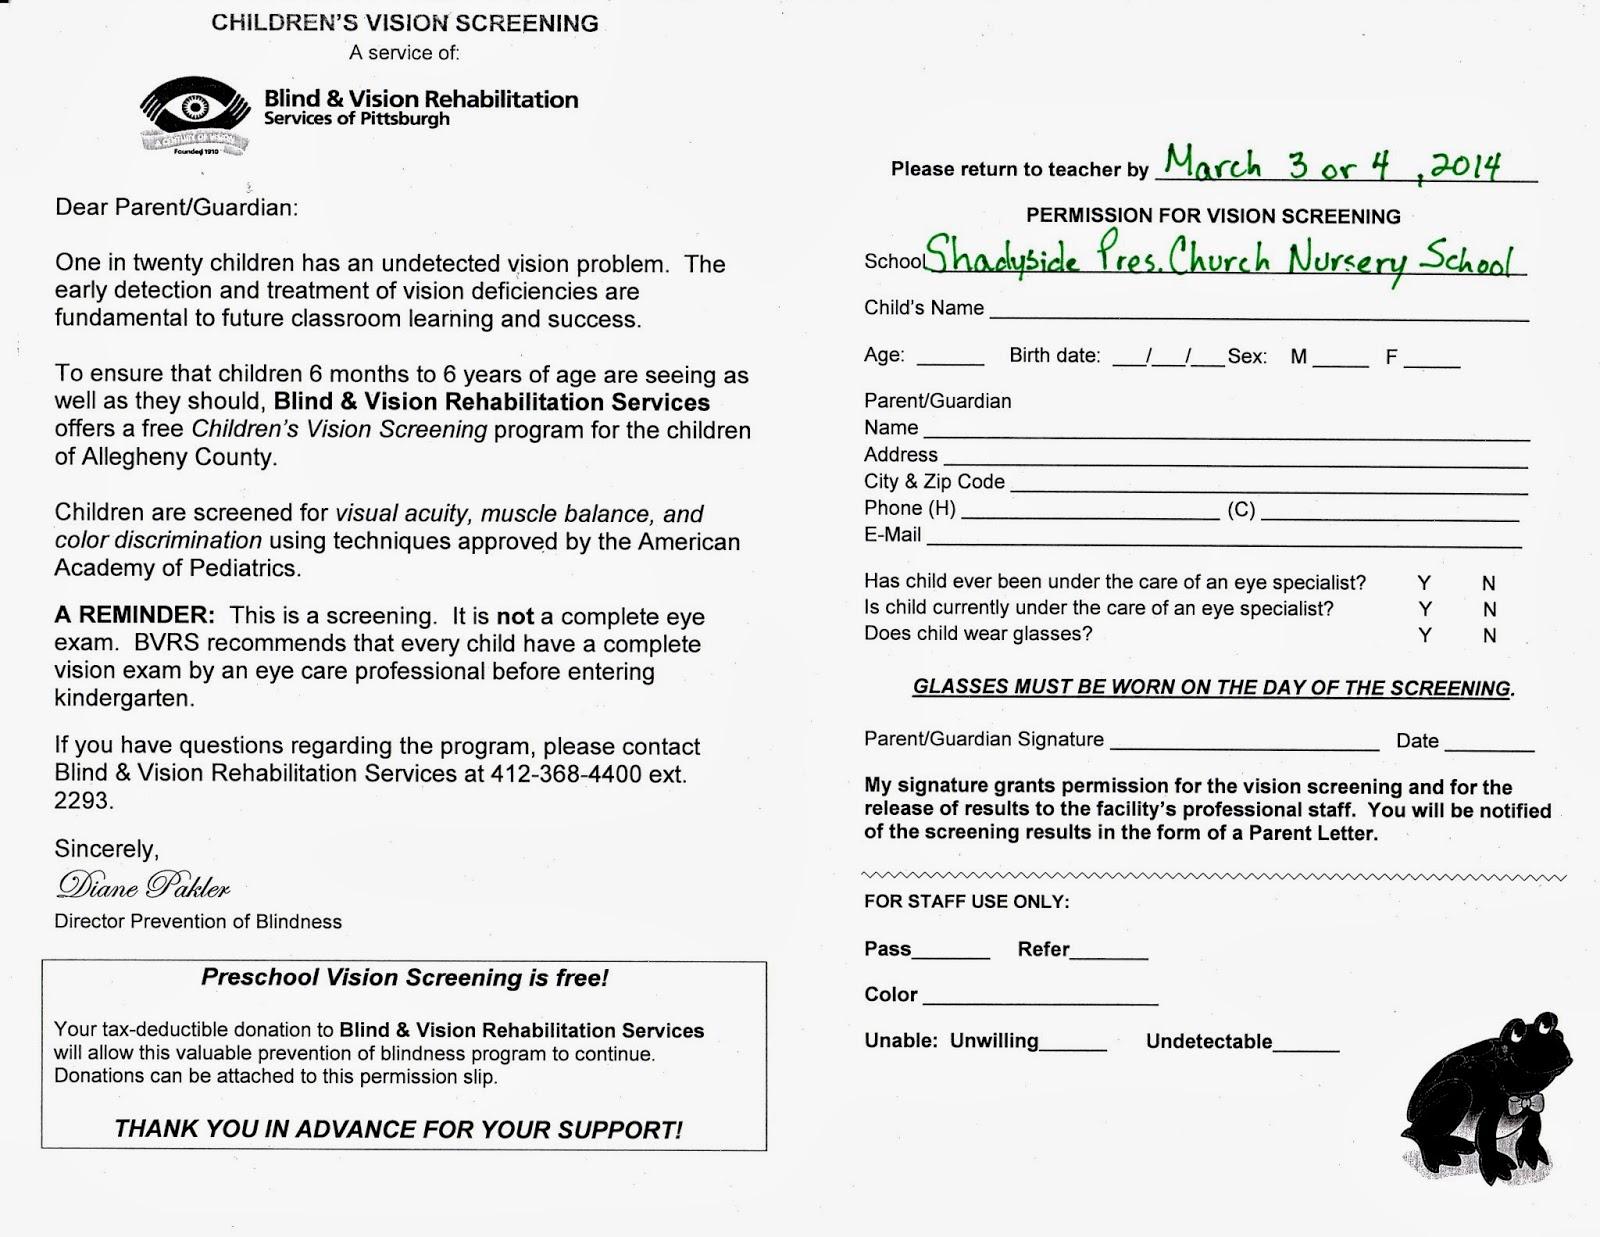 Shadyside Presbyterian Church Nursery School: Free Vision Screenings